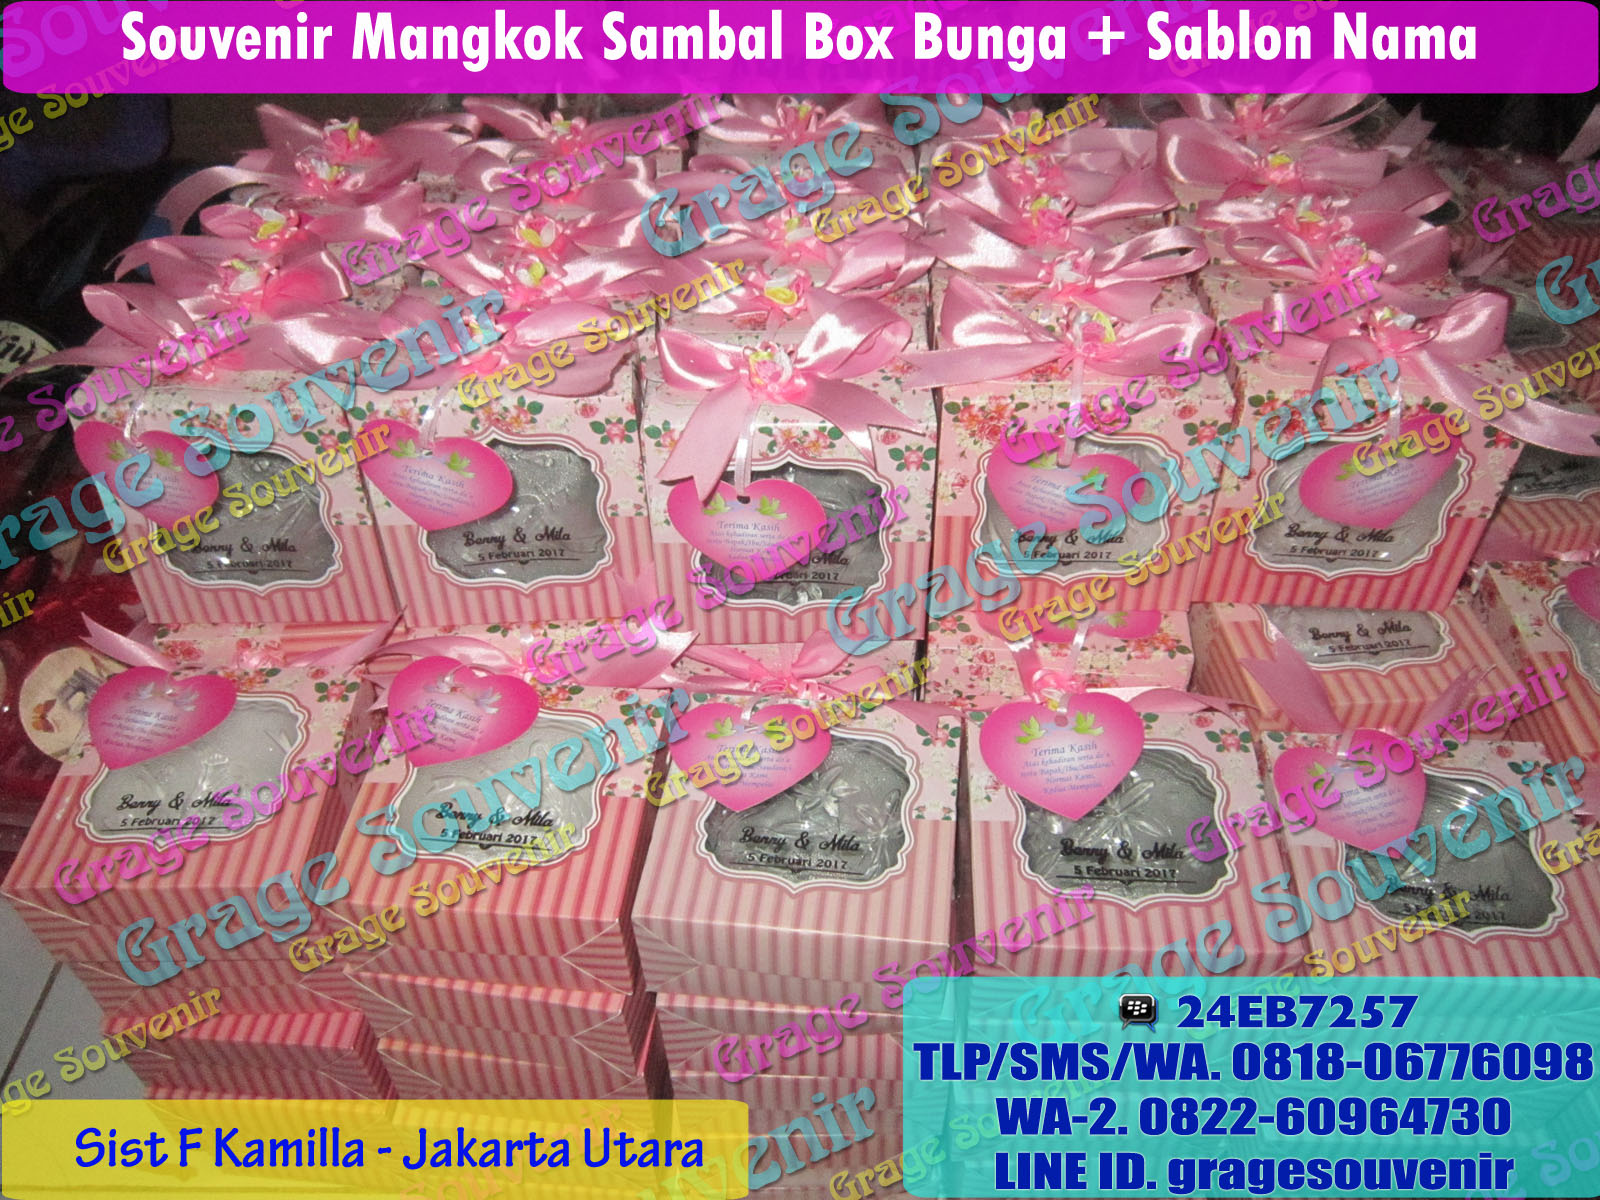 distributor souvenir mangkok sambal murah